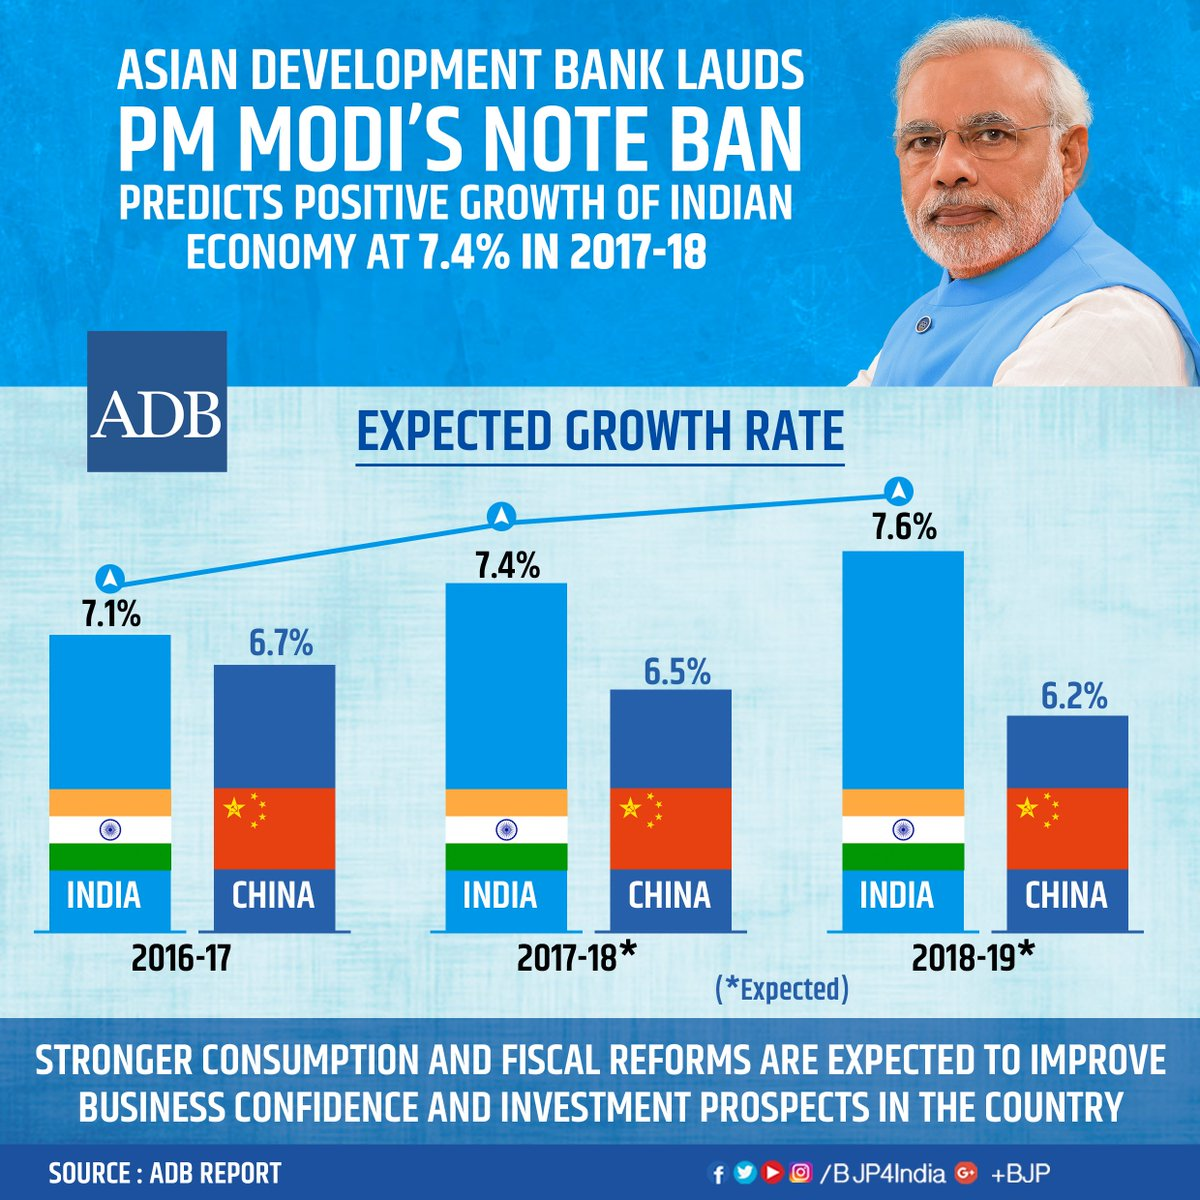 Asian development bank (adb) lauds pm modi's noteban ...  Asian developme...